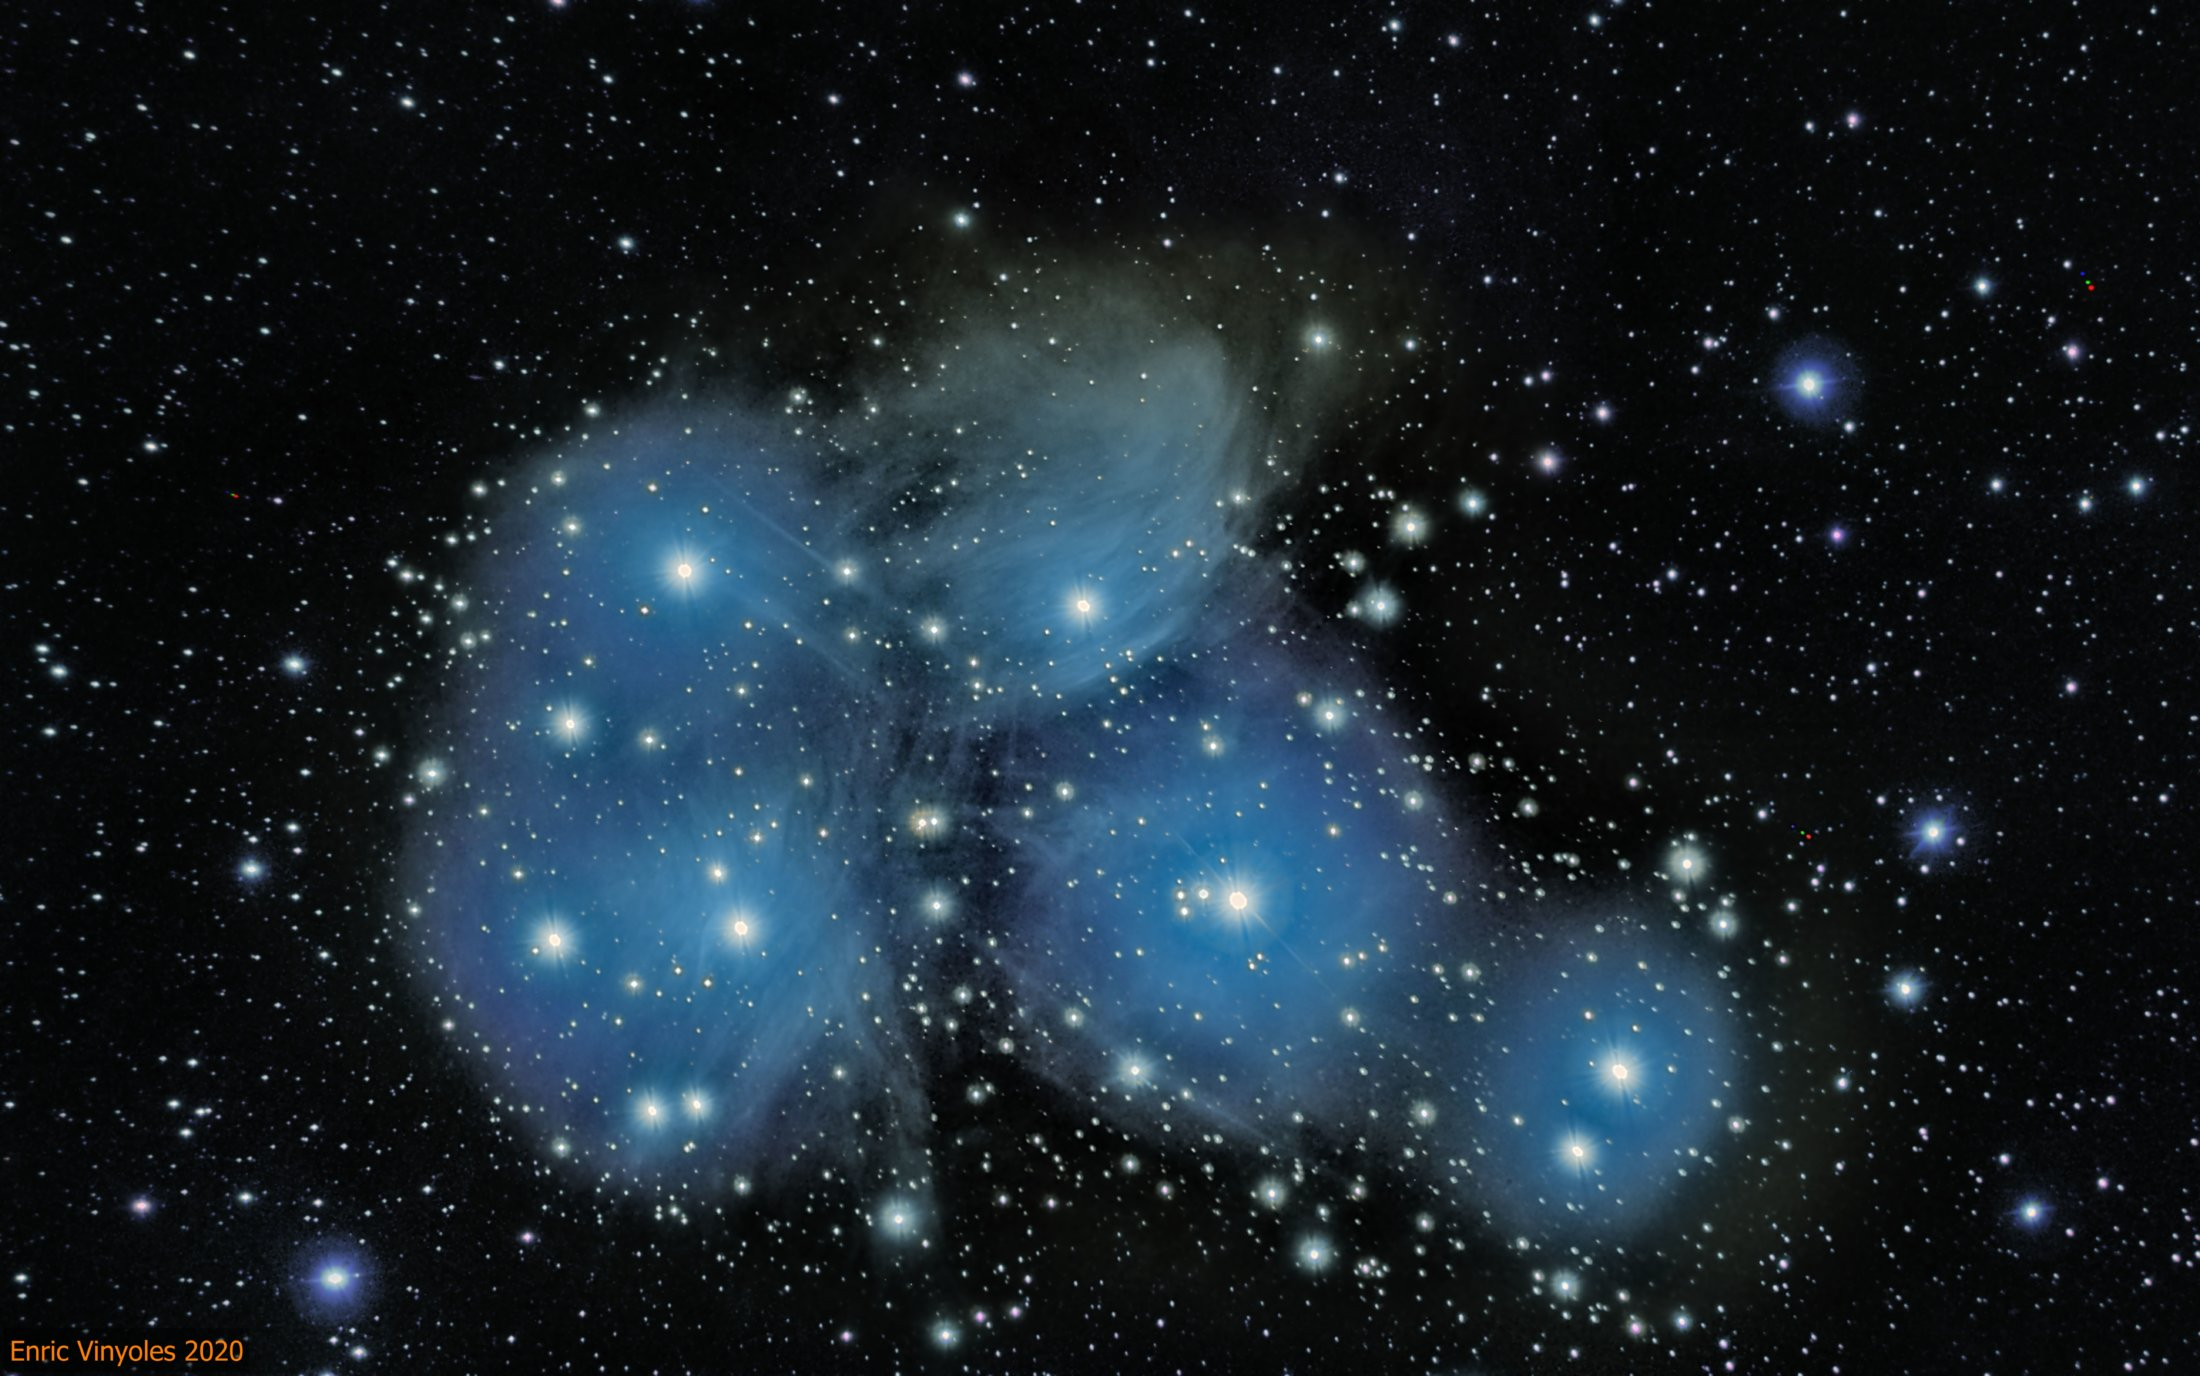 Pleiades - Enric Vinyoles